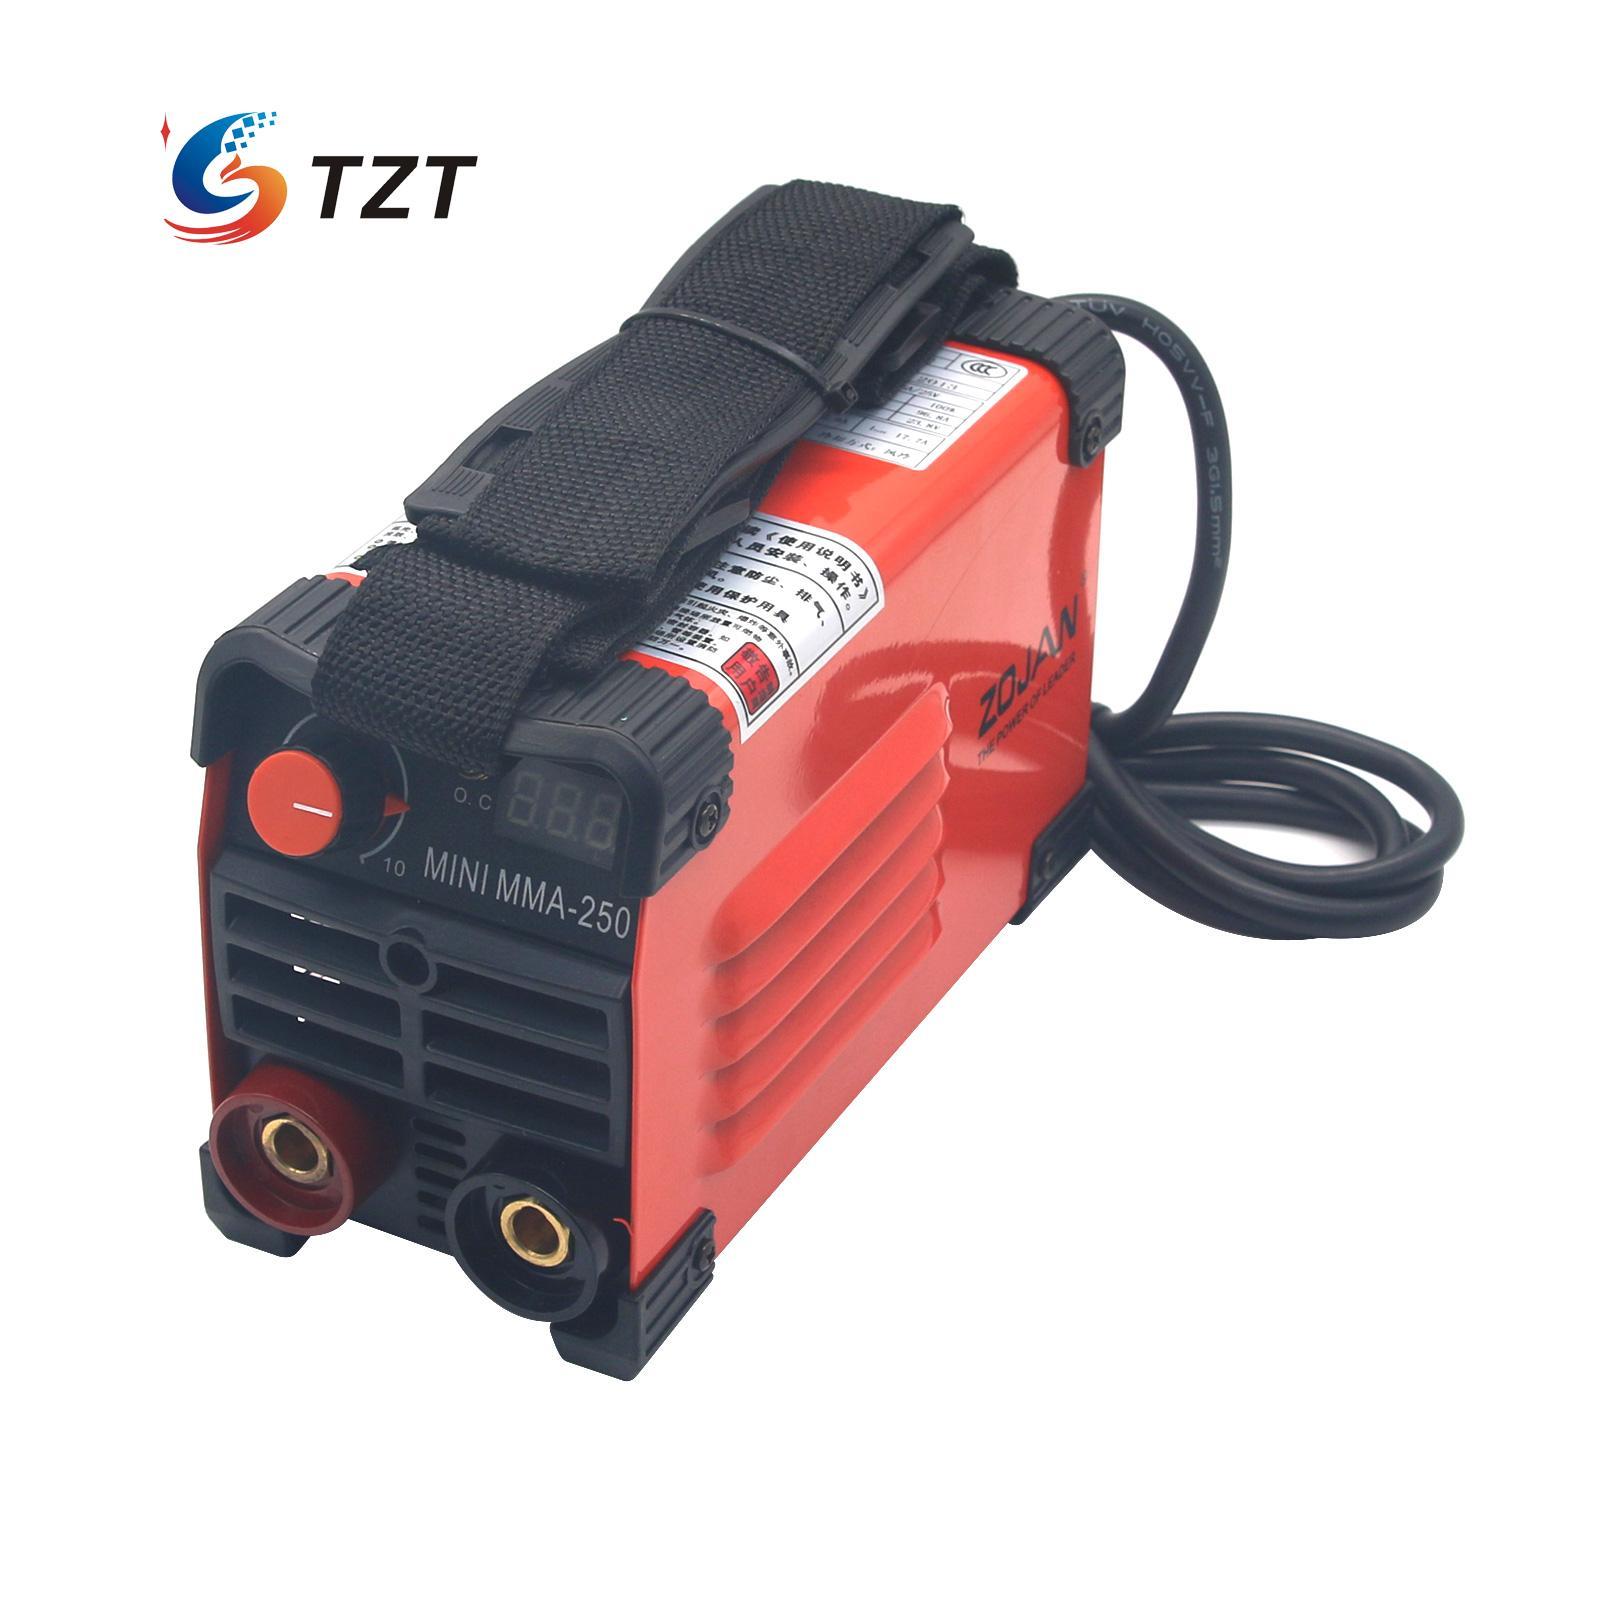 MMA Electric Welder Tool 220V 20-250A Handheld Mini Inverter ARC Welding Machine